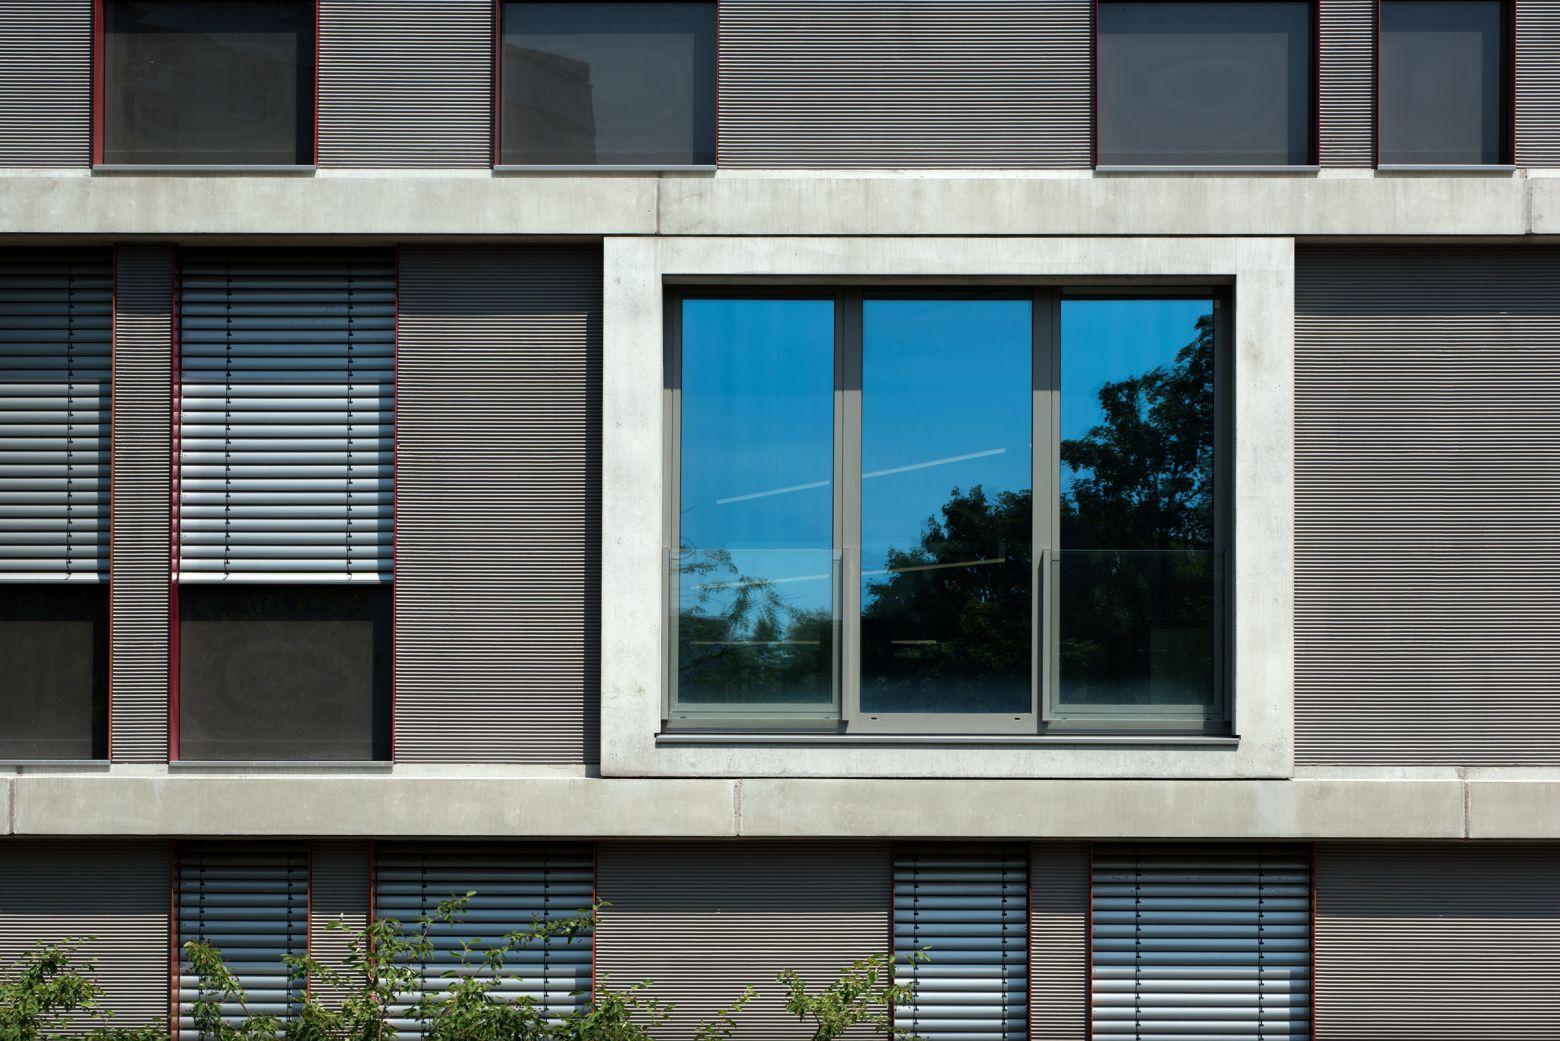 Fassadenteilansicht